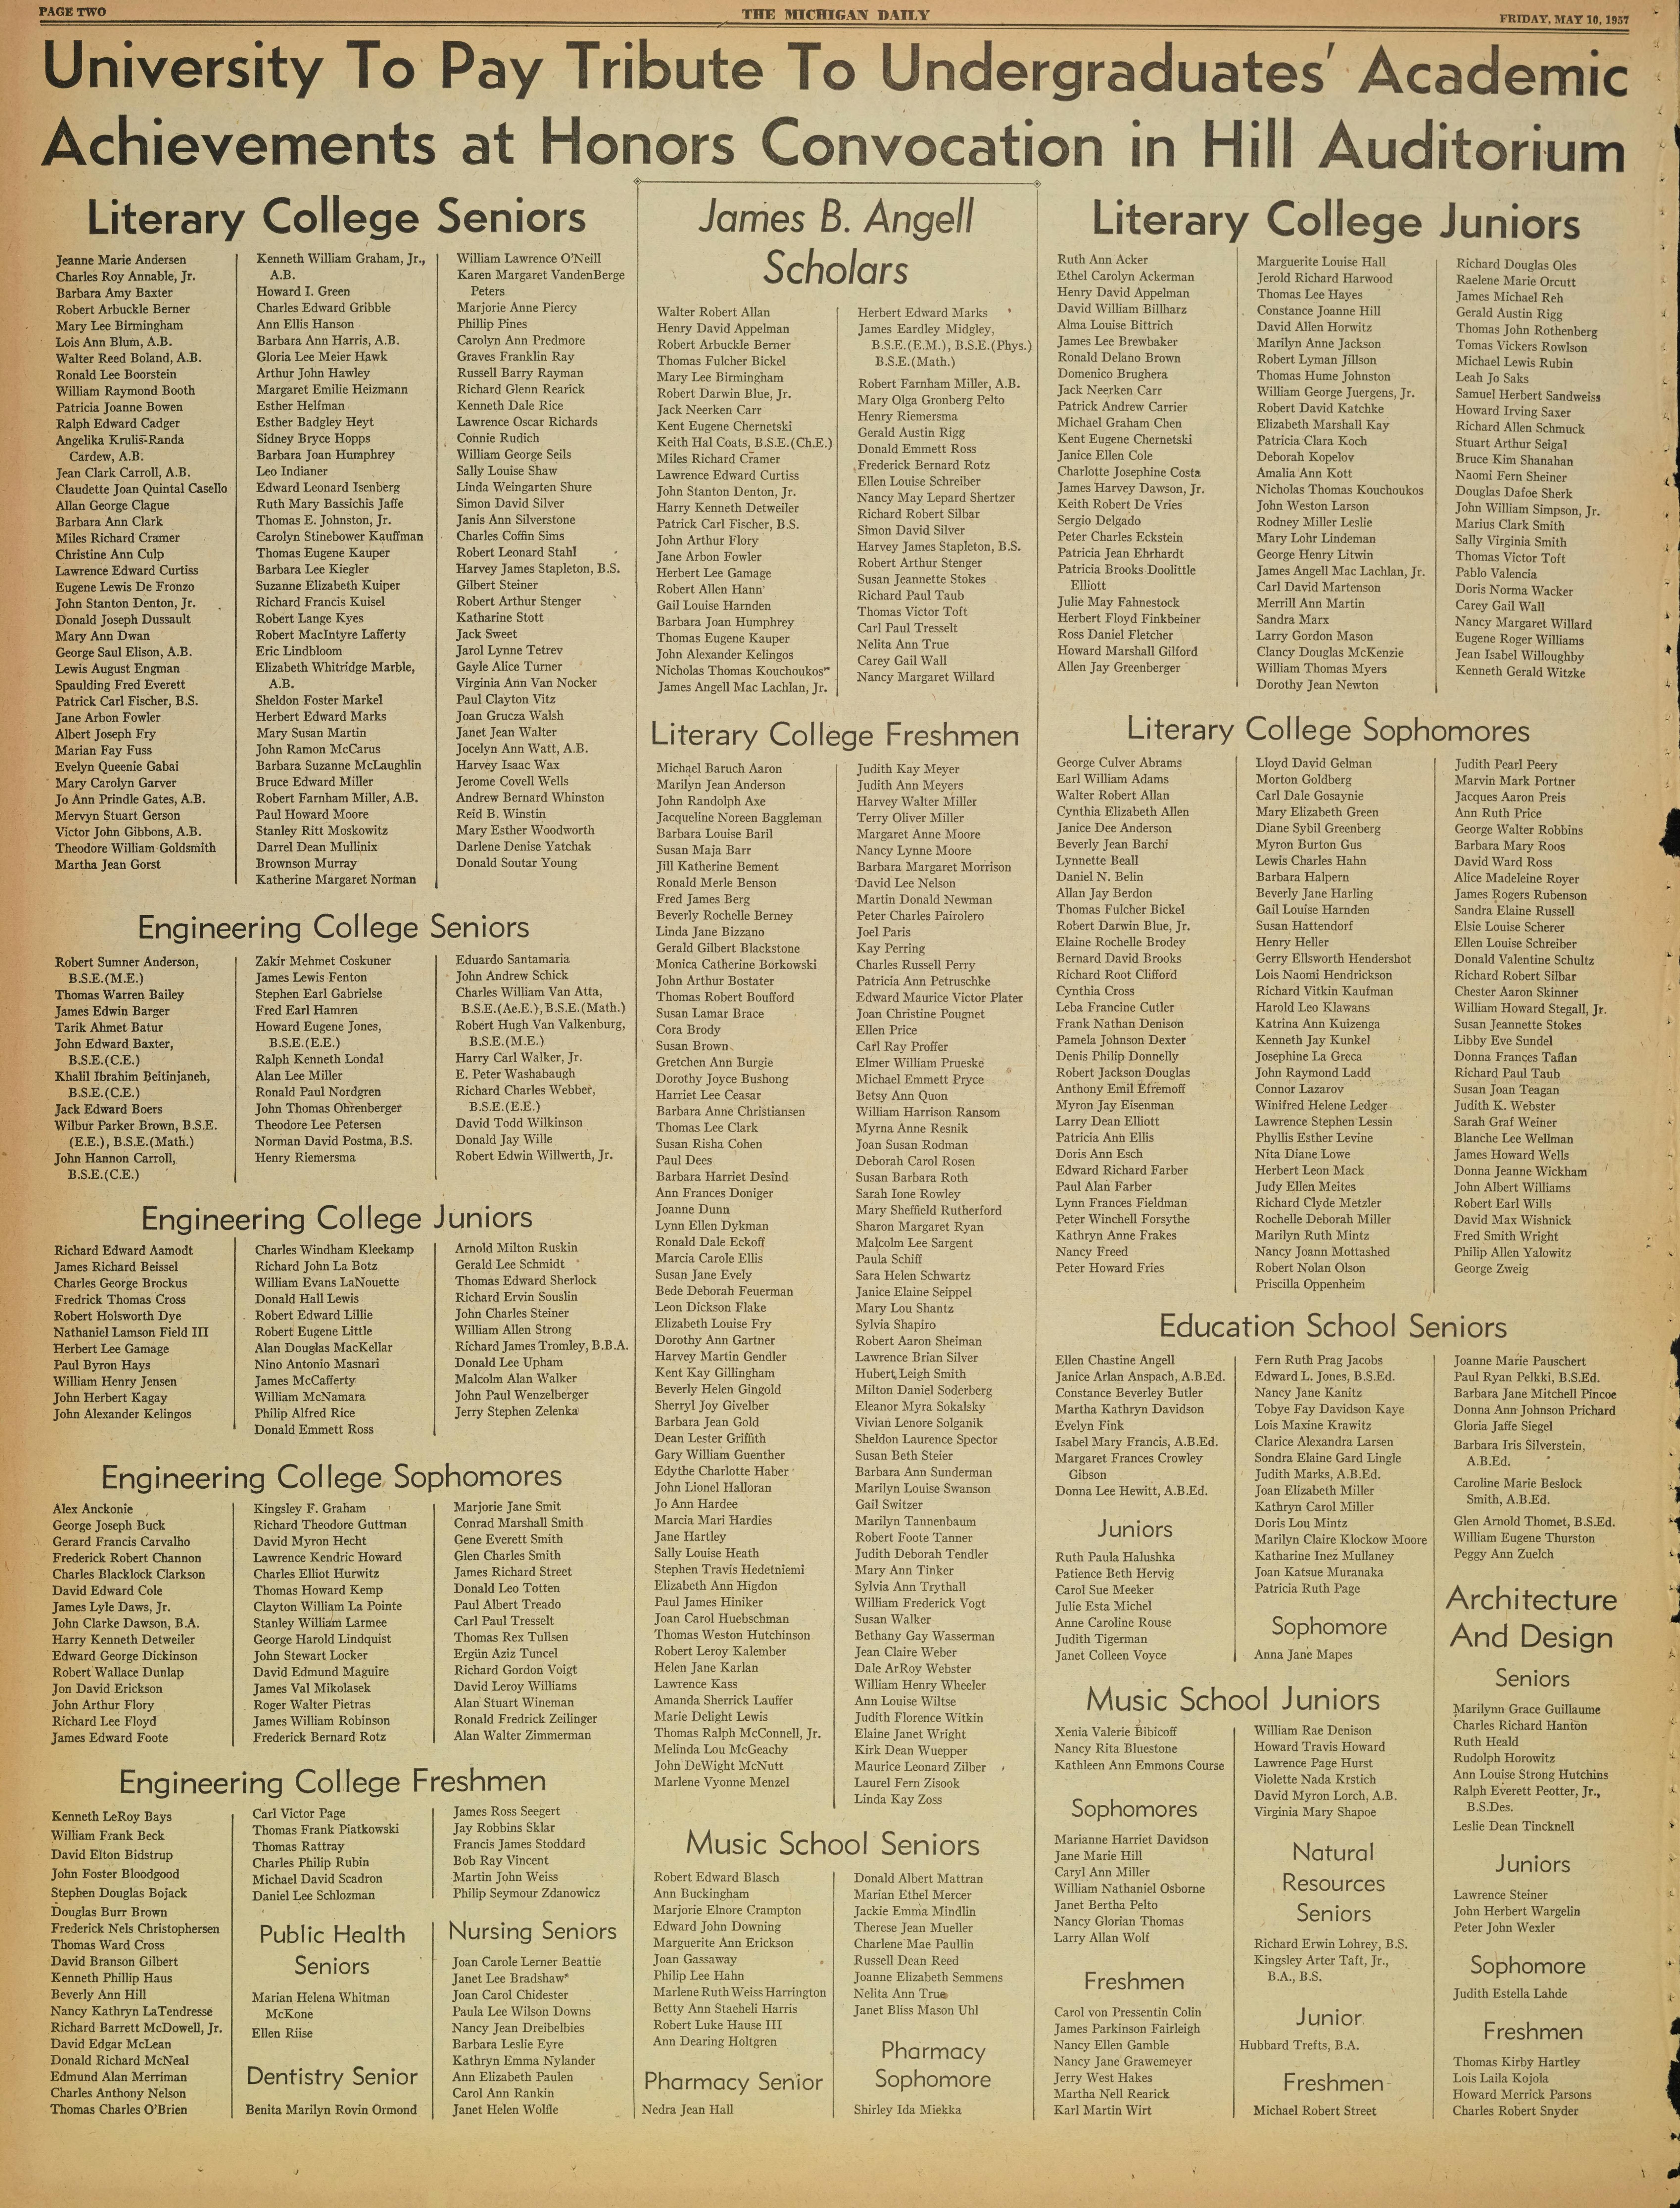 Michigan Daily Digital Archives - May 10, 1957 (vol  67, iss